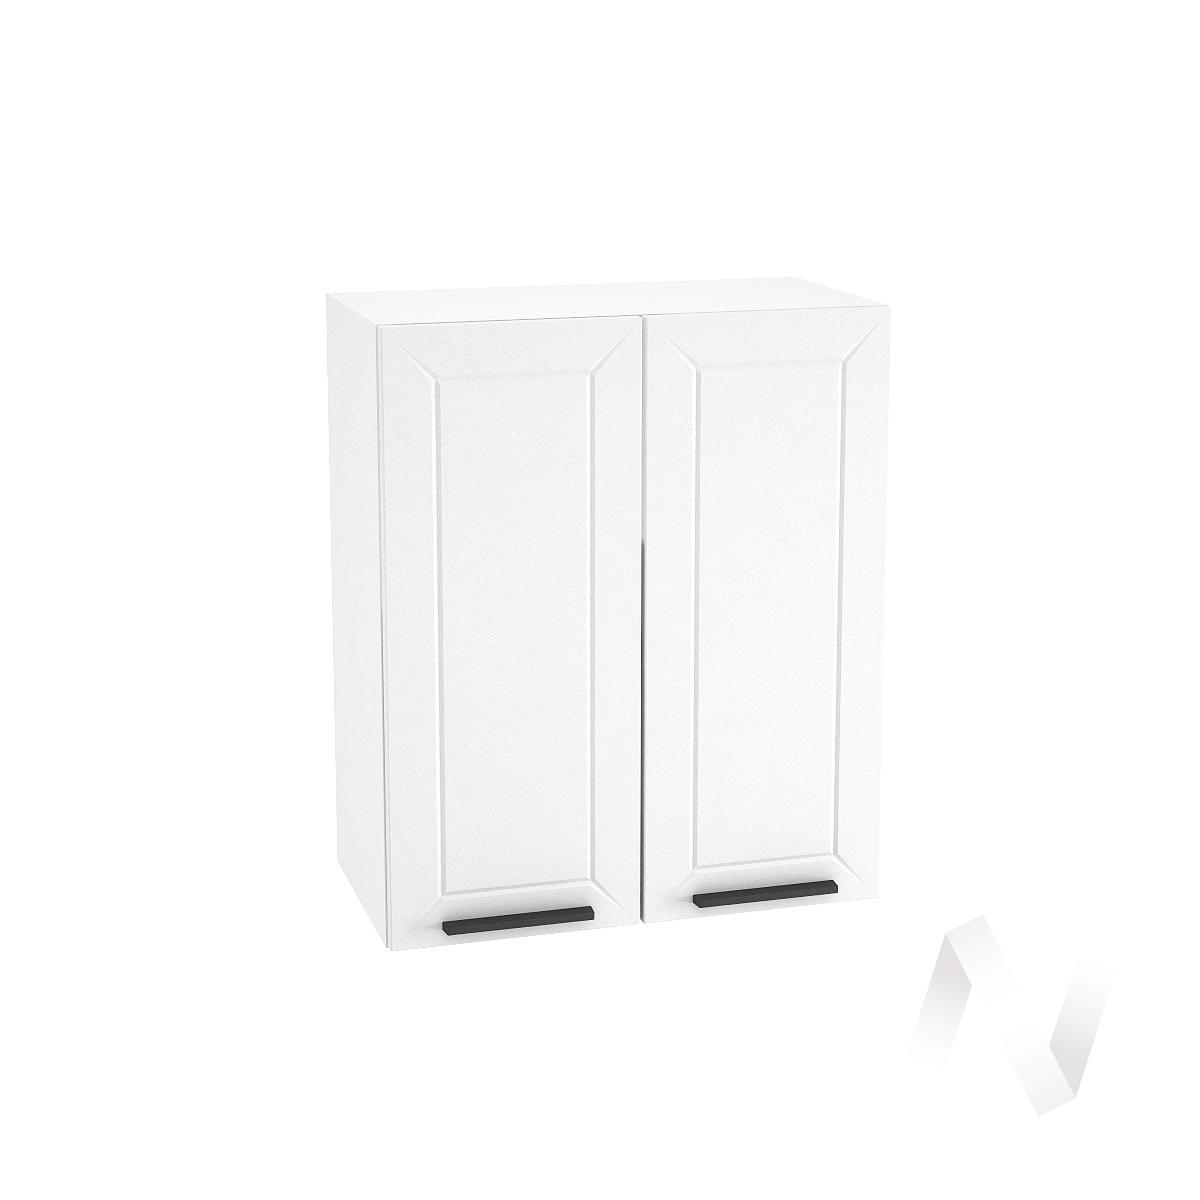 "Кухня ""Глетчер"": Шкаф верхний 600, ШВ 600 (Айленд Силк/корпус белый)"